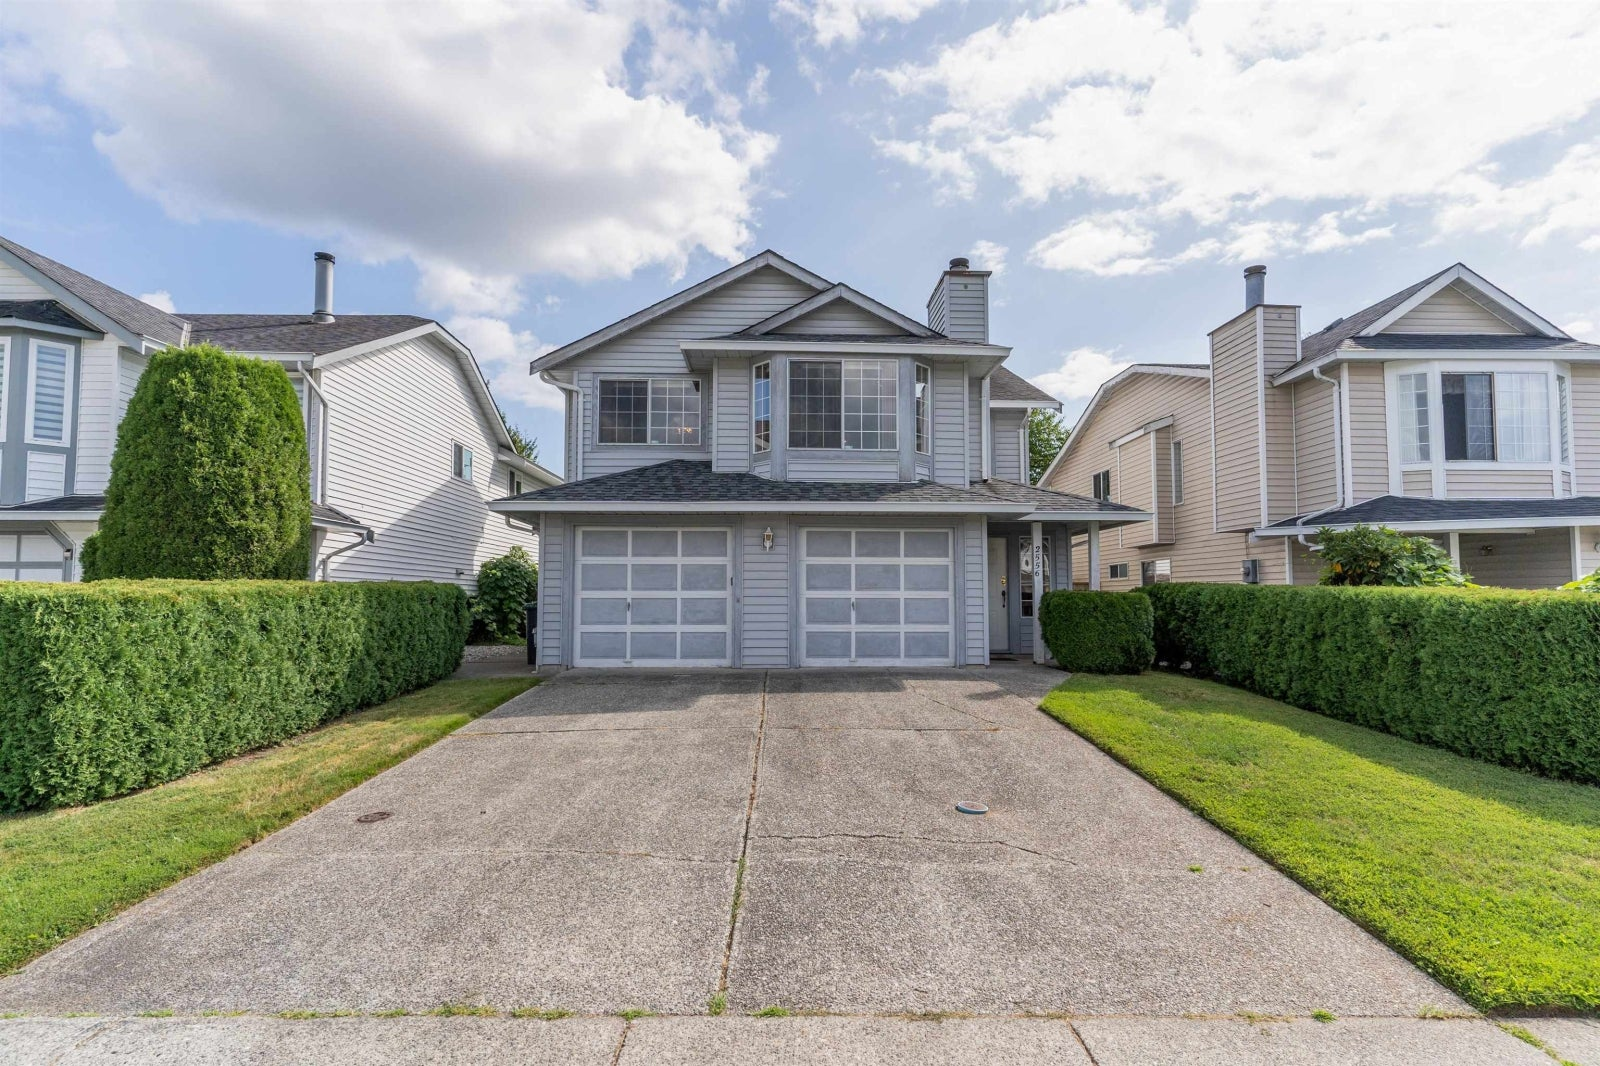 2556 RAVEN COURT - Eagle Ridge CQ House/Single Family for sale, 4 Bedrooms (R2611826) #2